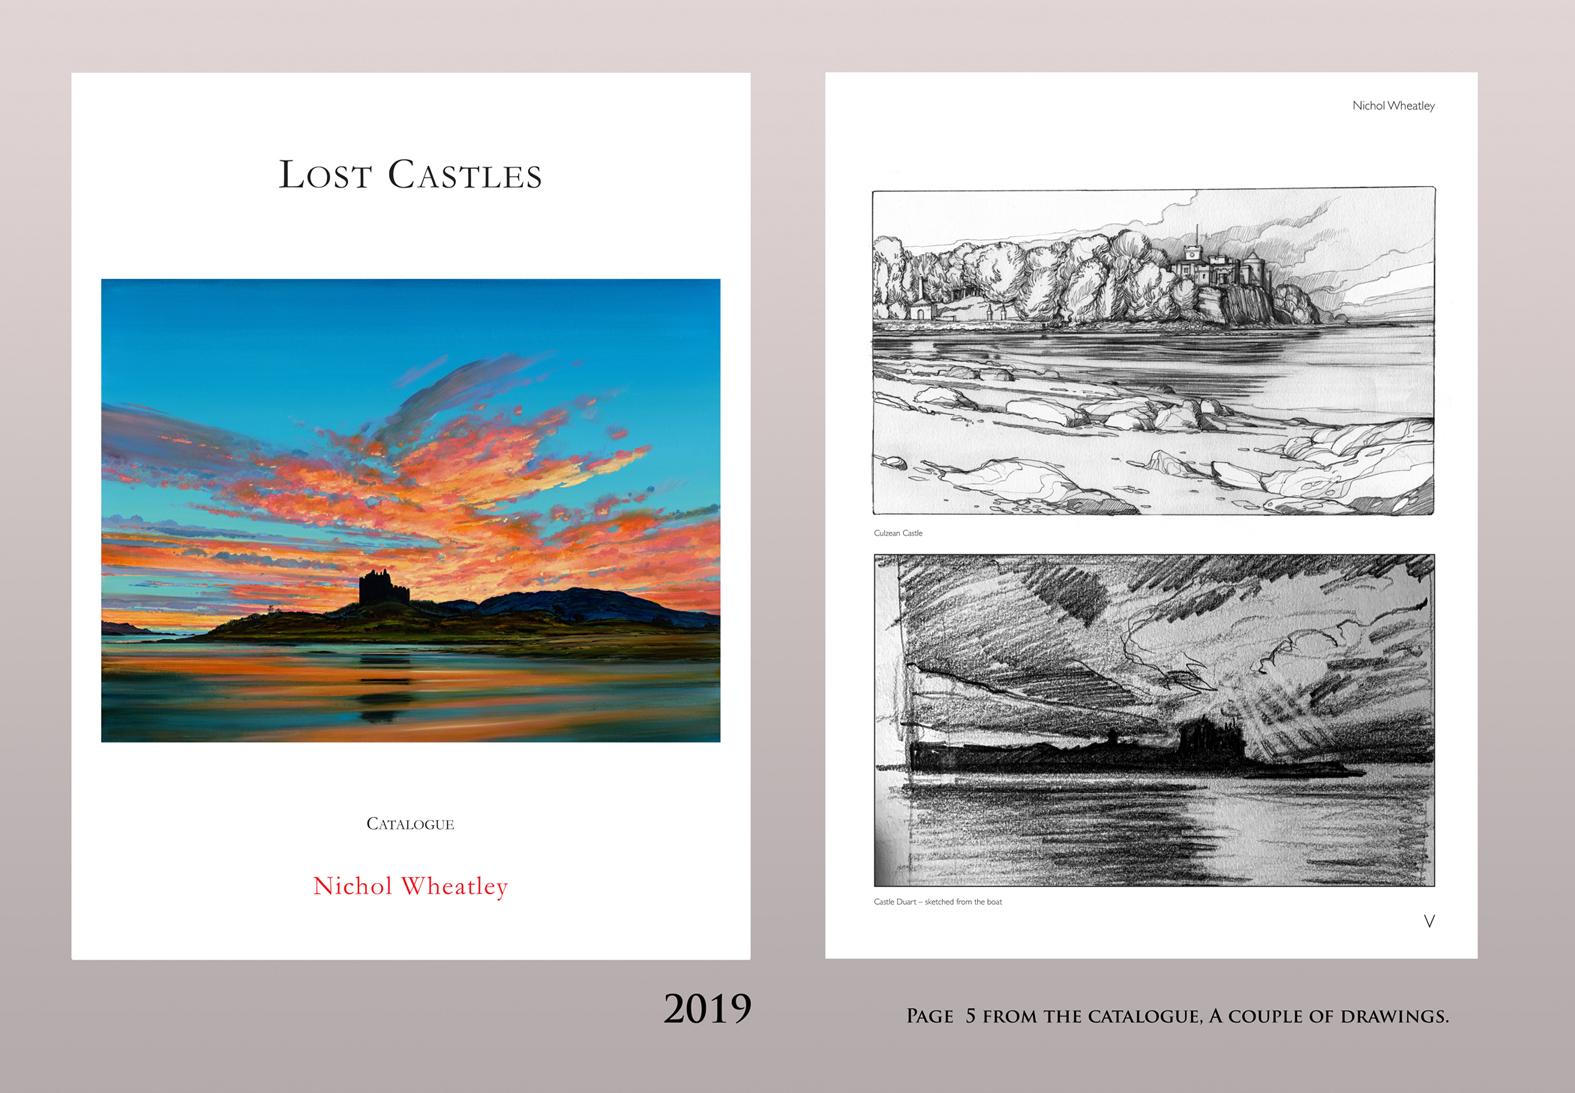 Lost Castles Catalogue